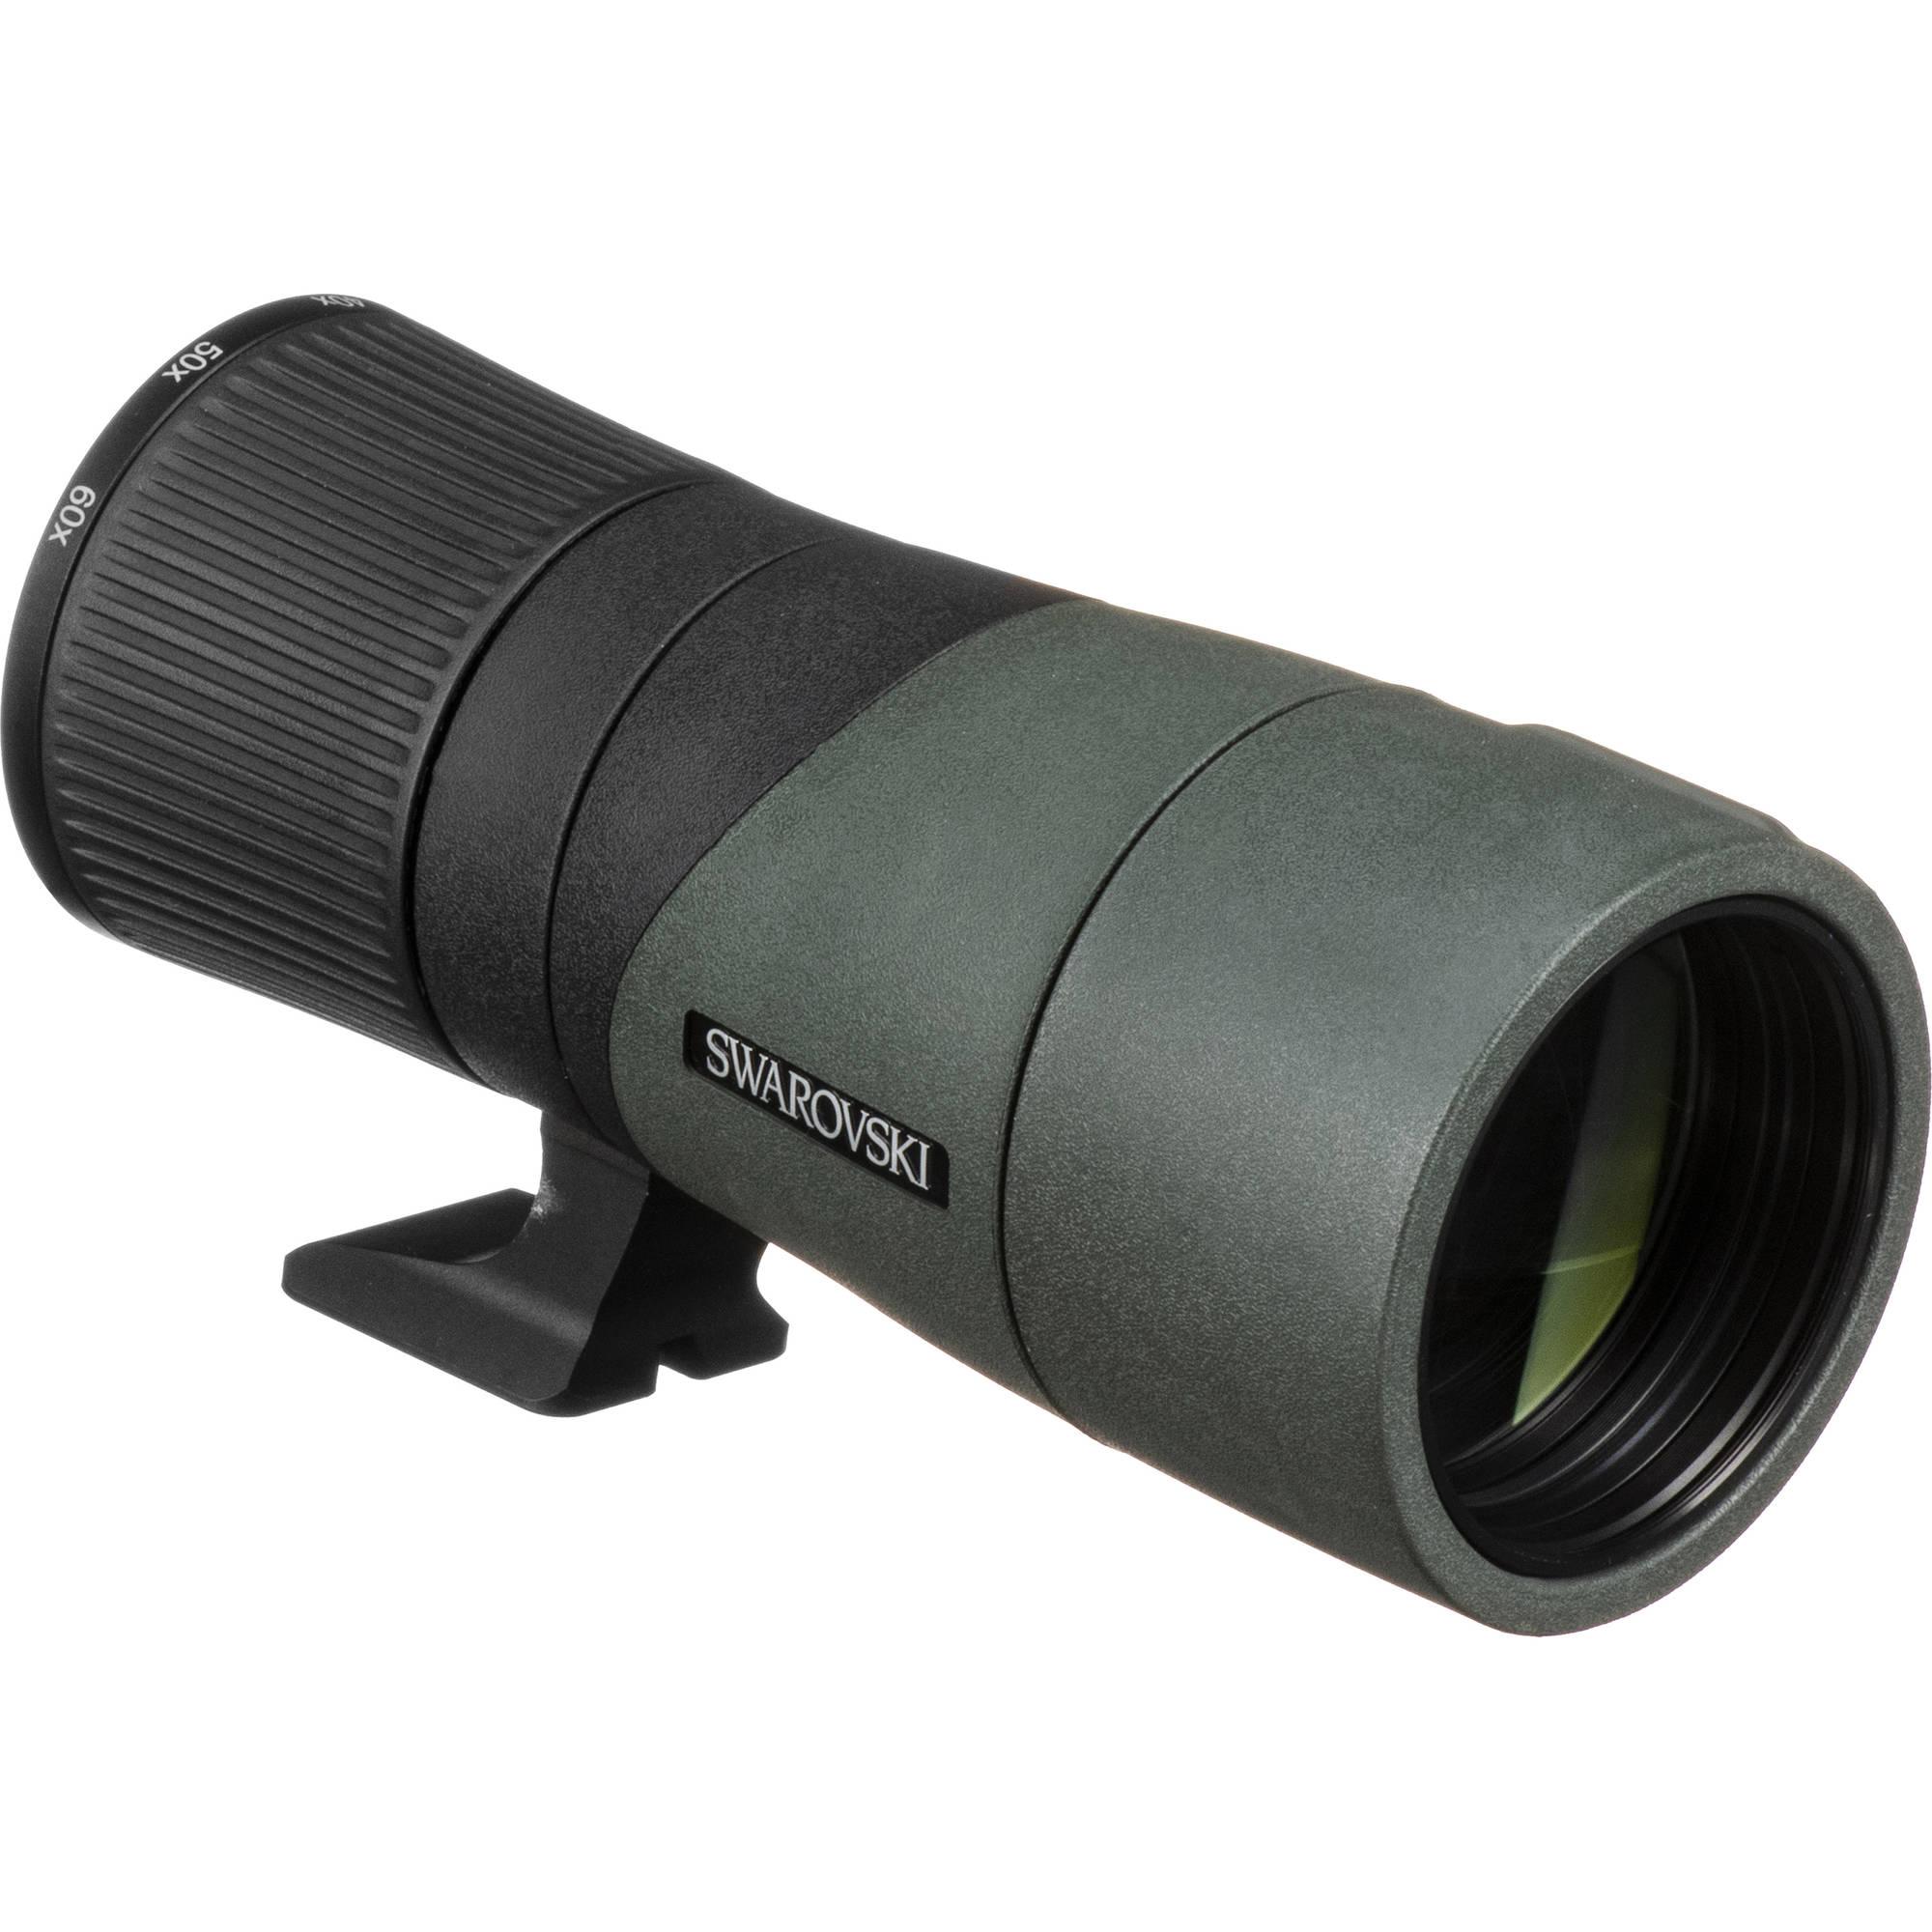 Swarovski Atx Stx Btx 65mm Objective Lens Module 48865 B H Photo